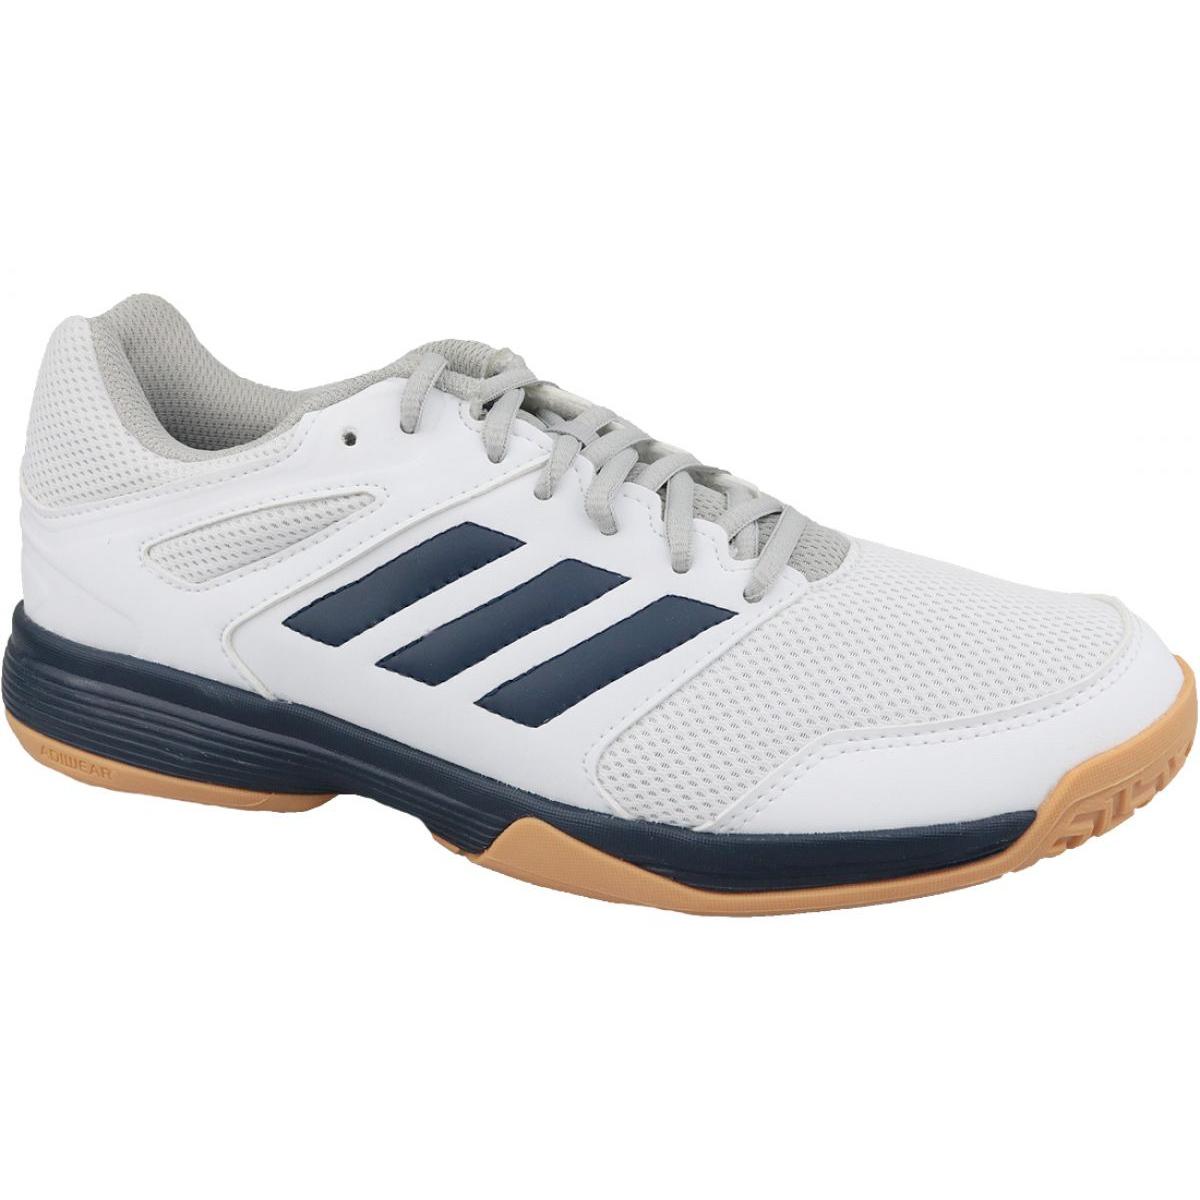 Adidas Herren Schwarz Schuhe Ultra Boost Ausschließen,Adidas